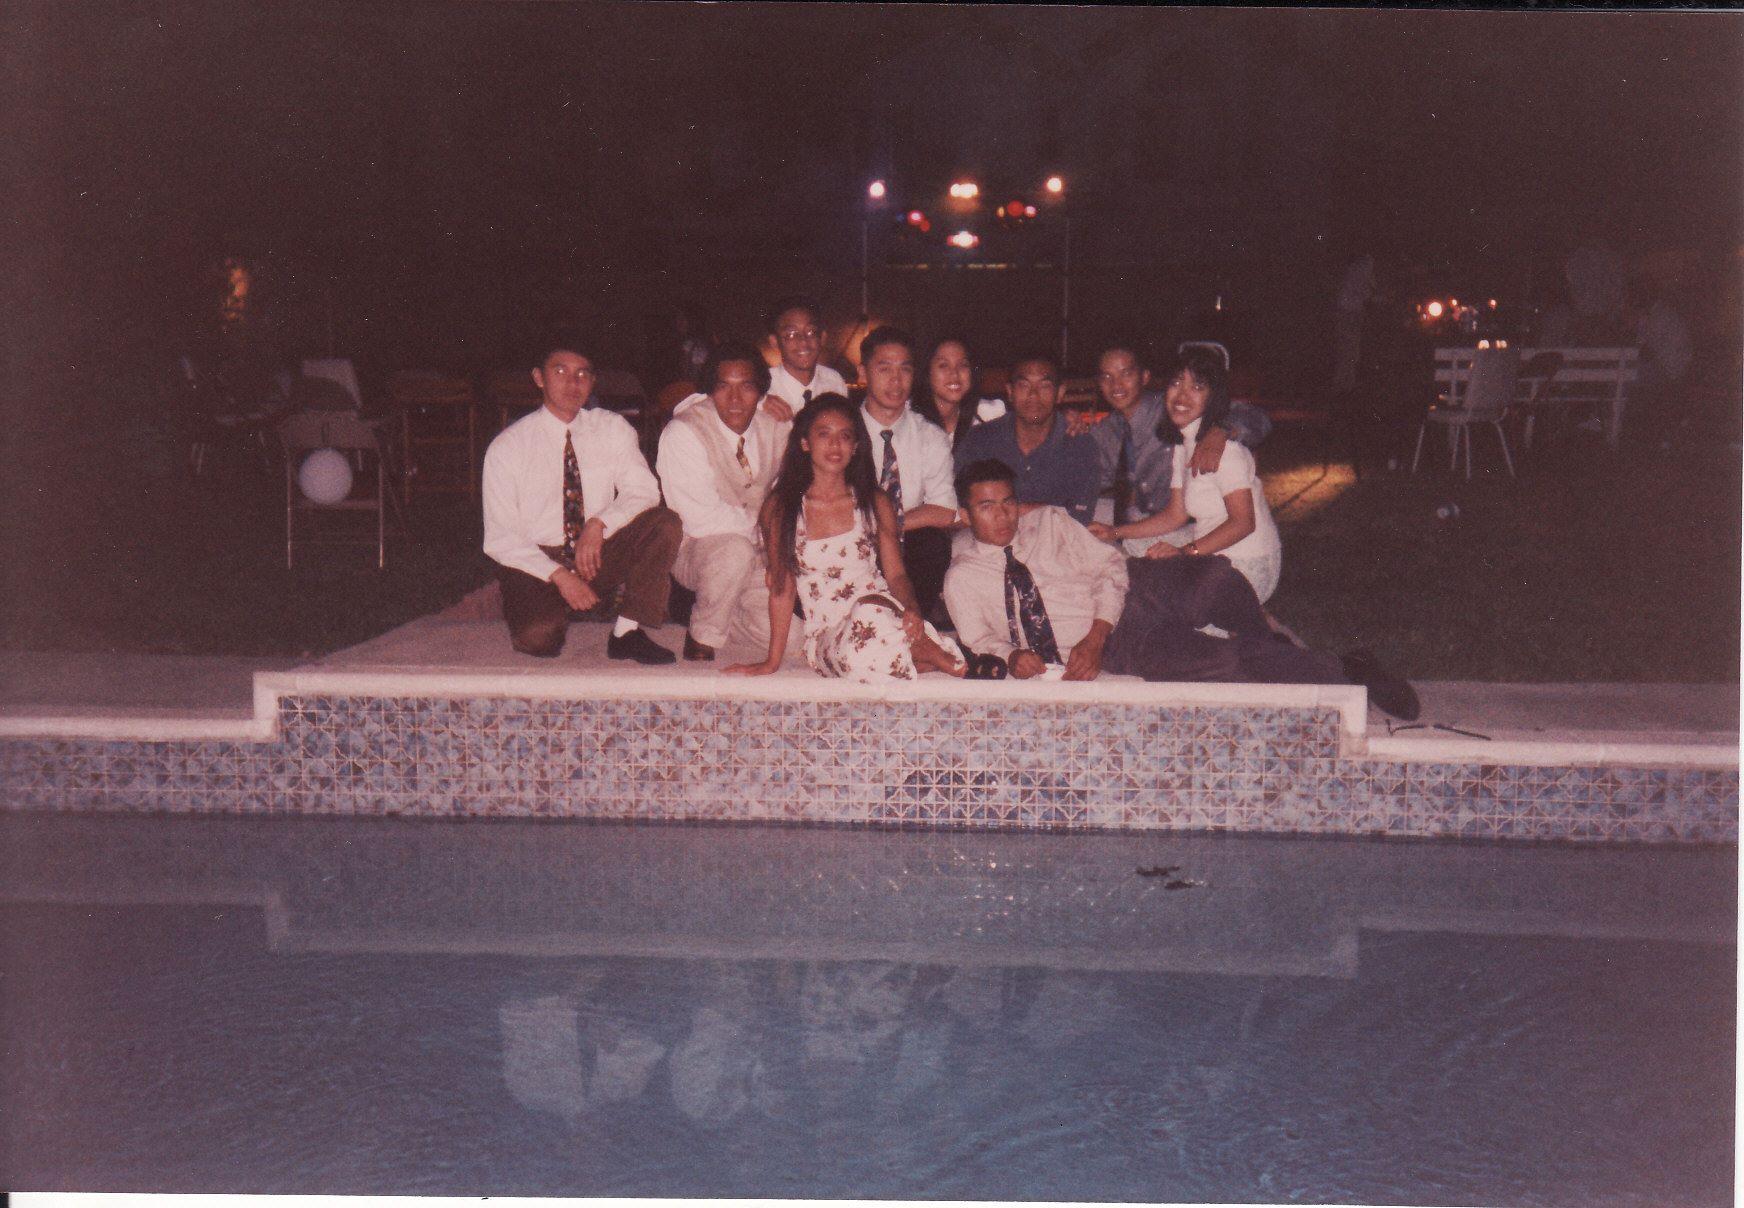 Spring 1994:  President - Emilyn Neri ,Normand Savellano, William Manalo, Reggie Dones,  Alex Laspiñas, Haze Bunoan, Joan Cruz, David Macayaon, Rowena Ramos,Ronald Casino